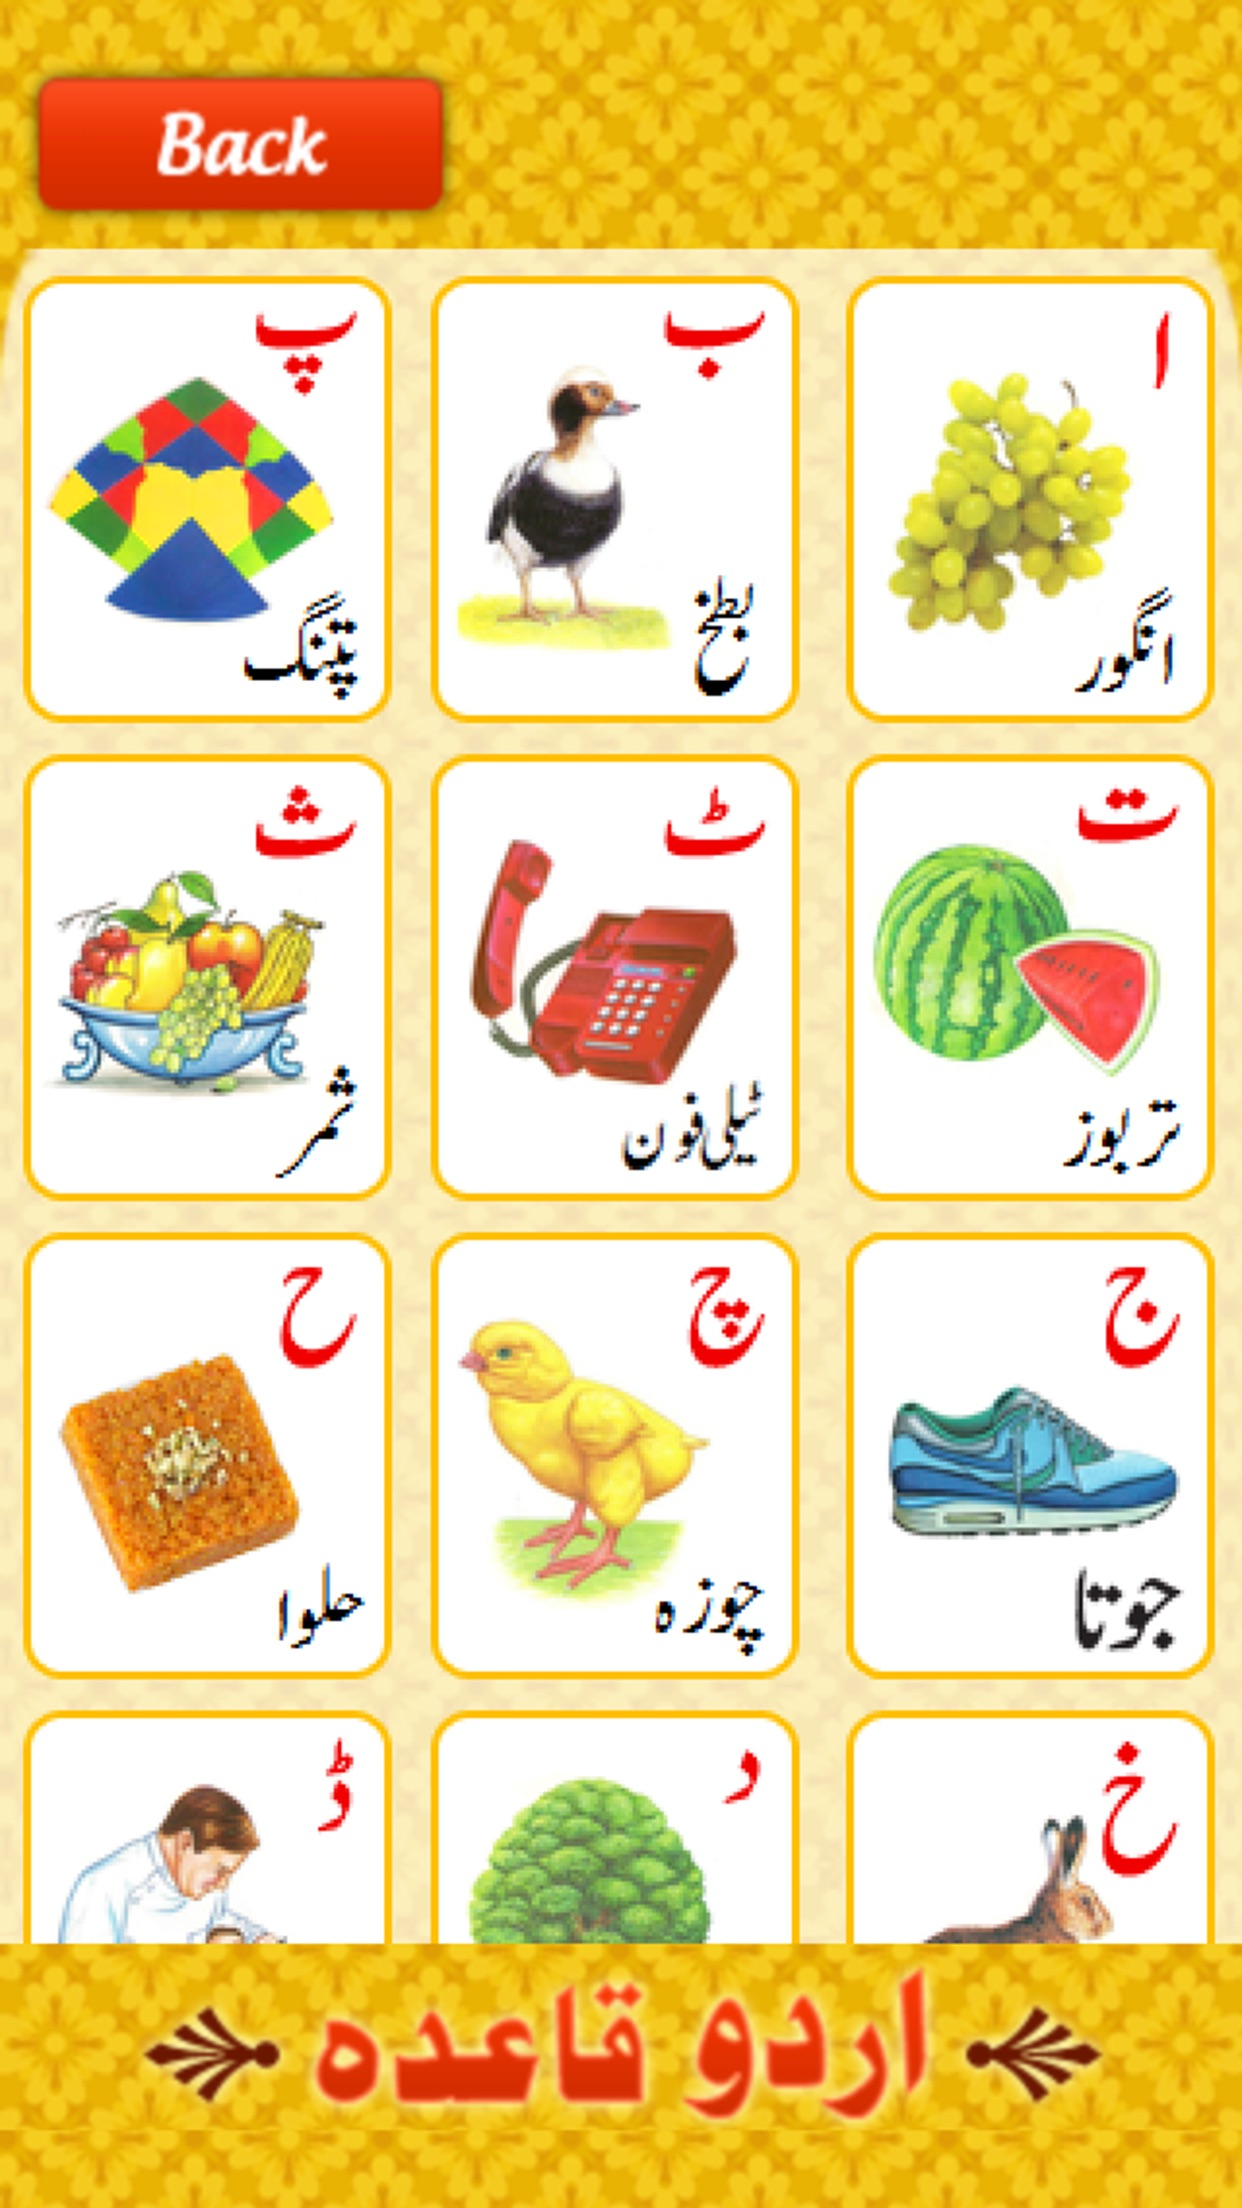 Urdu Qaida Free - Learn Alphabets Alif Bay Pay Kids Screenshot